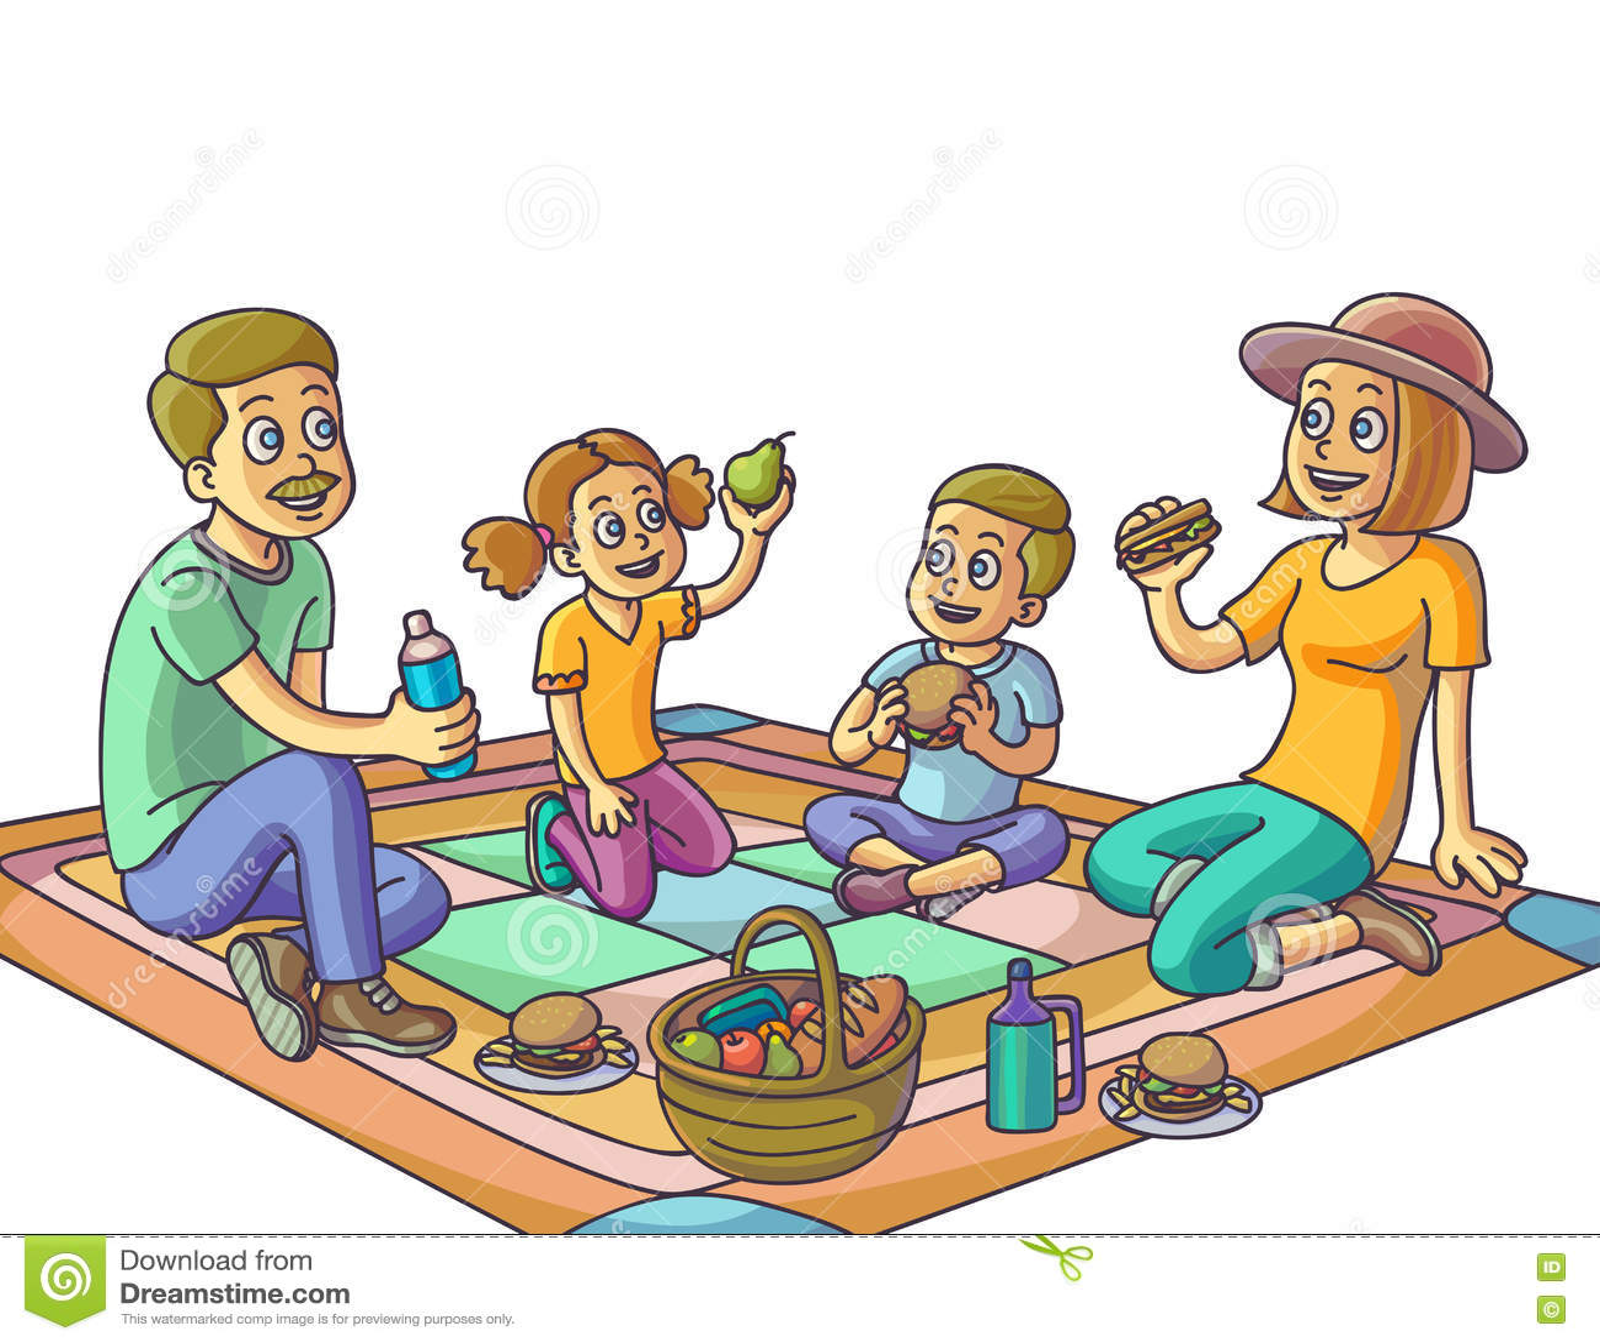 family picnic clipart - photo #43